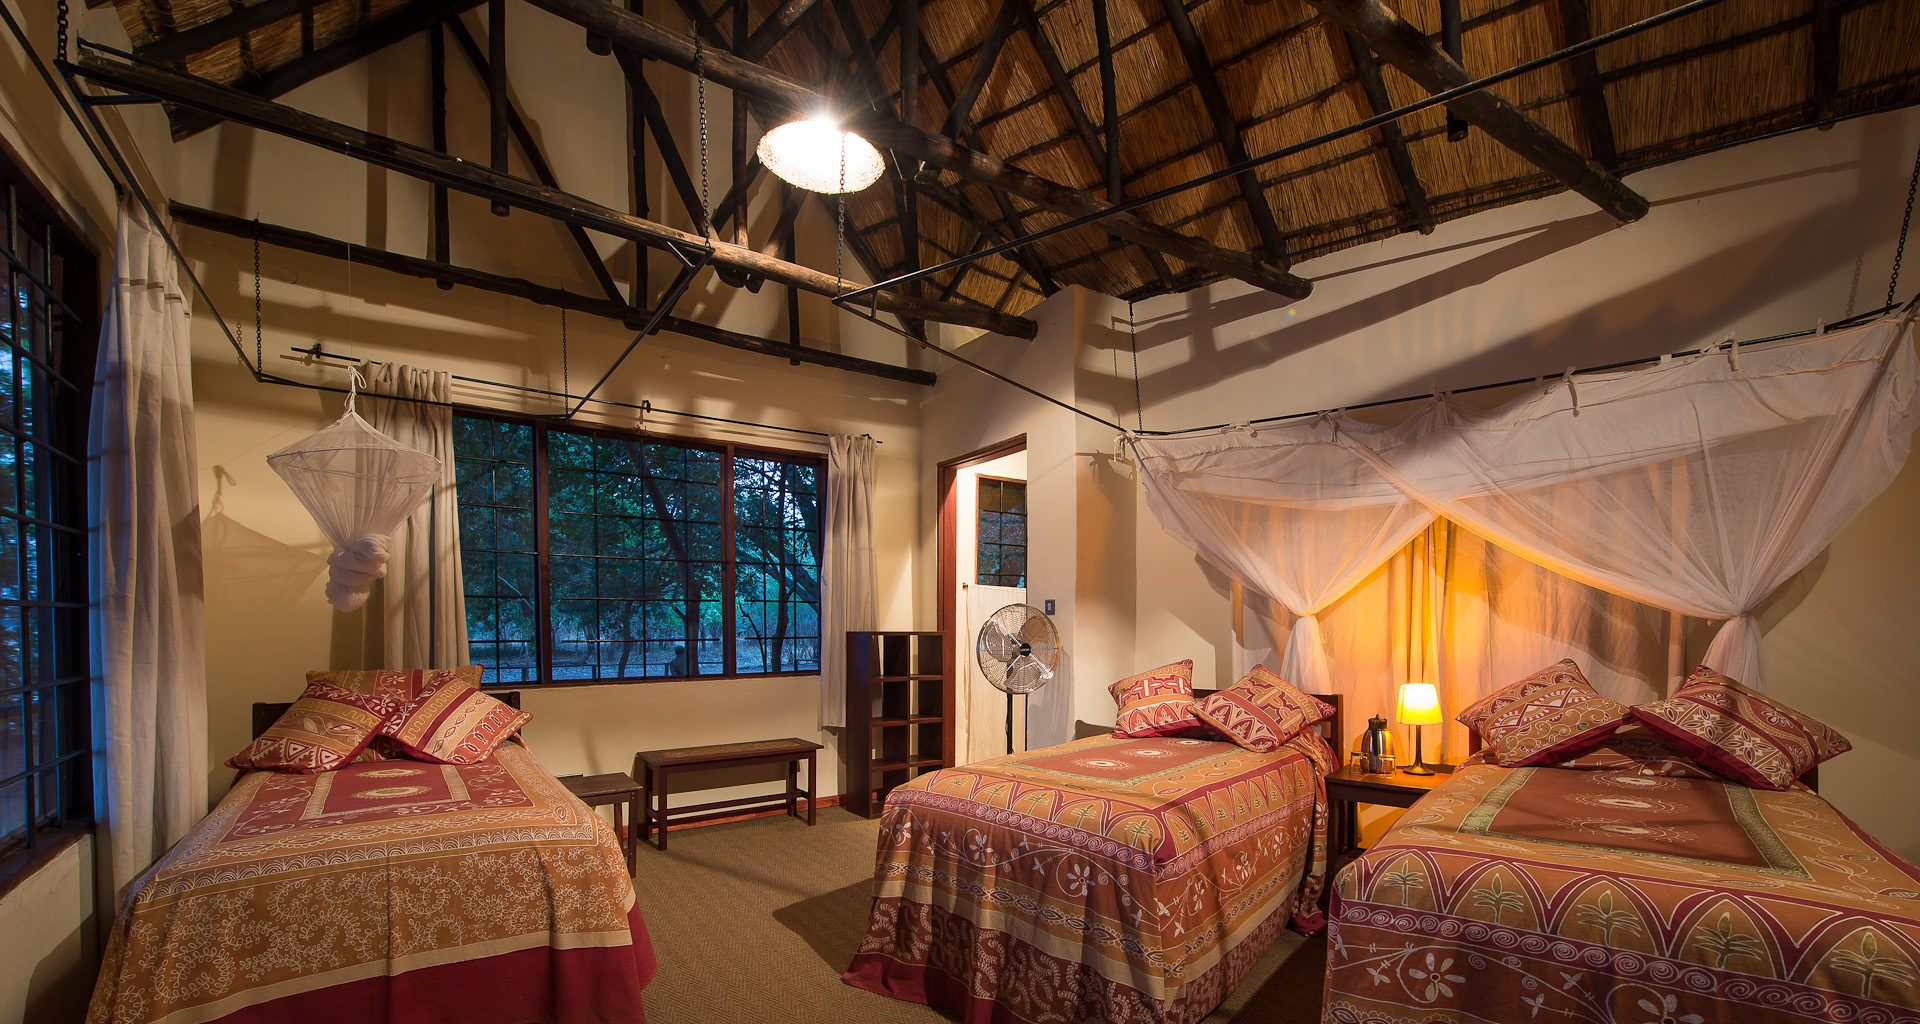 Robins-House-Zambia bedroom